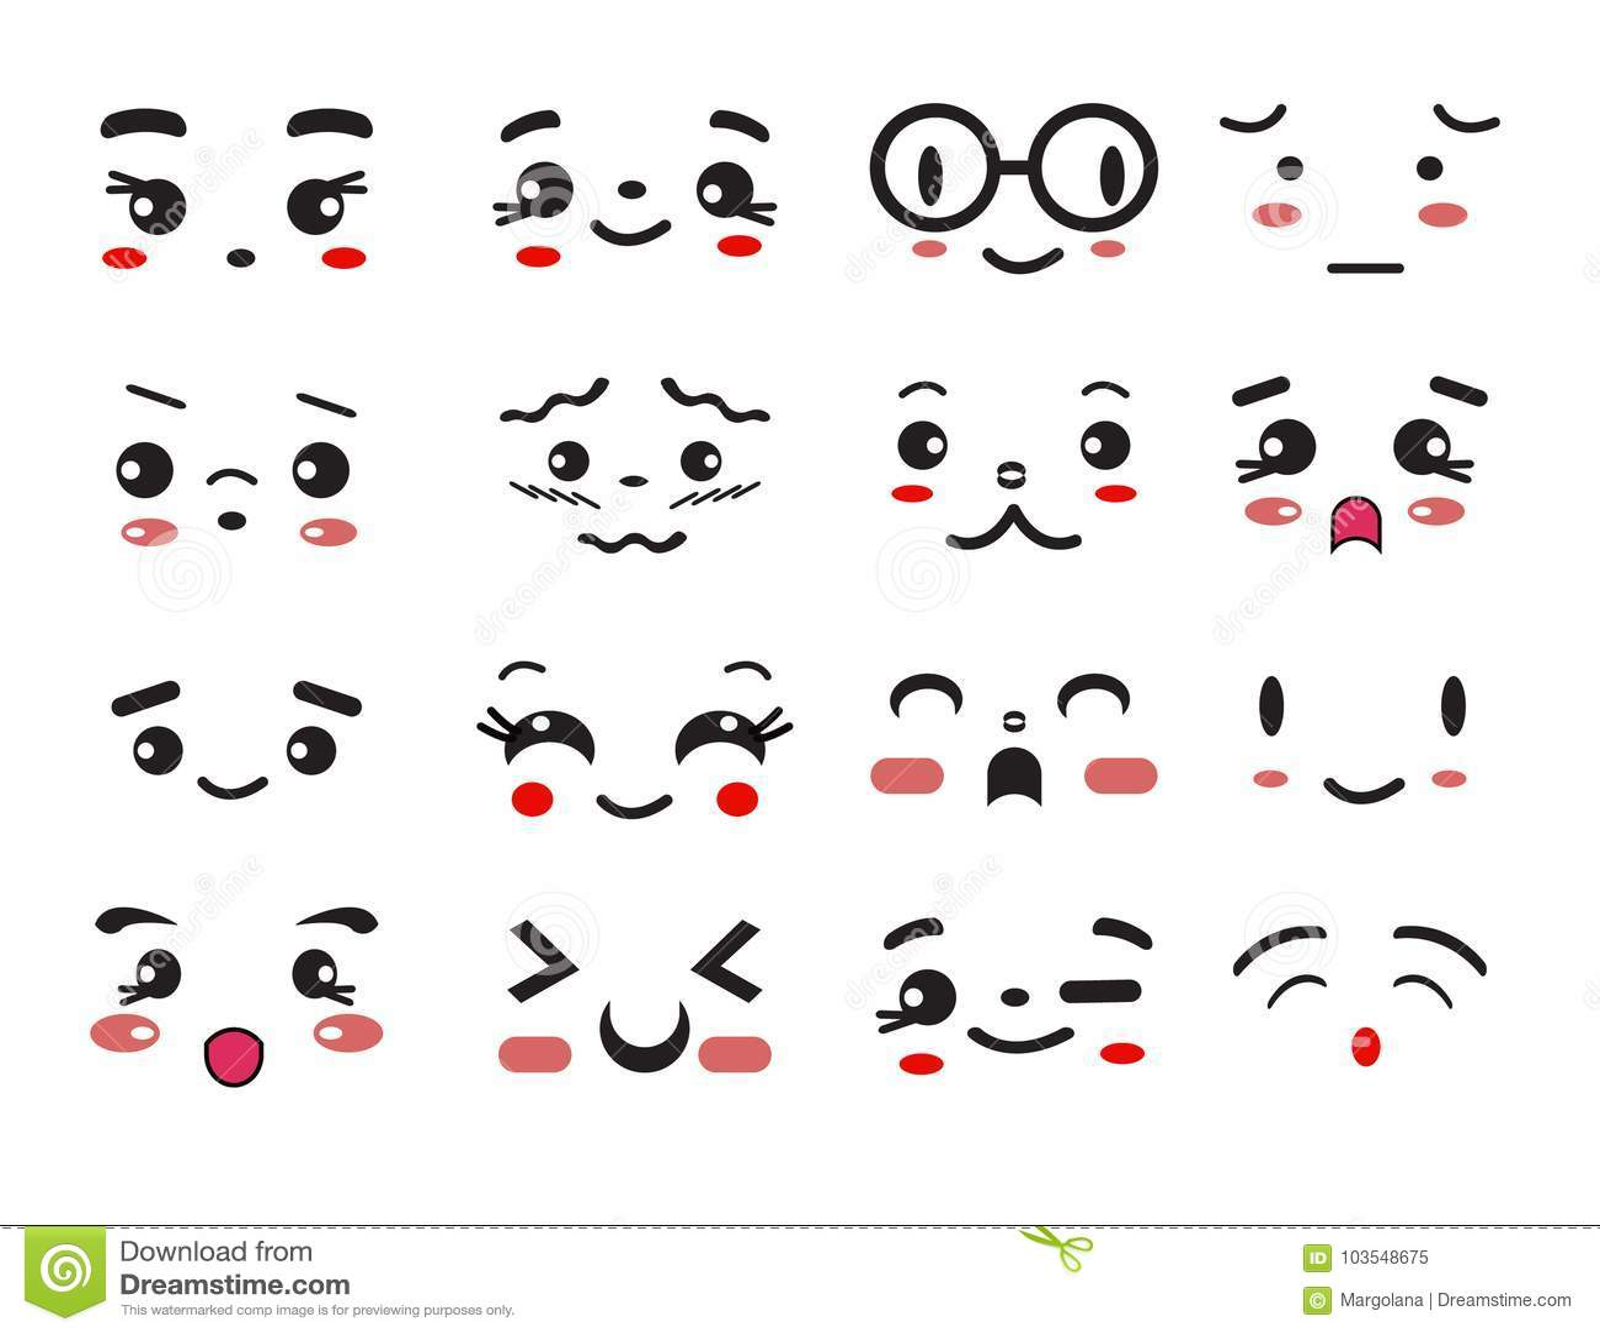 Kawaii Cute Smile Emoticons And Japanese Anime Emoji Stock